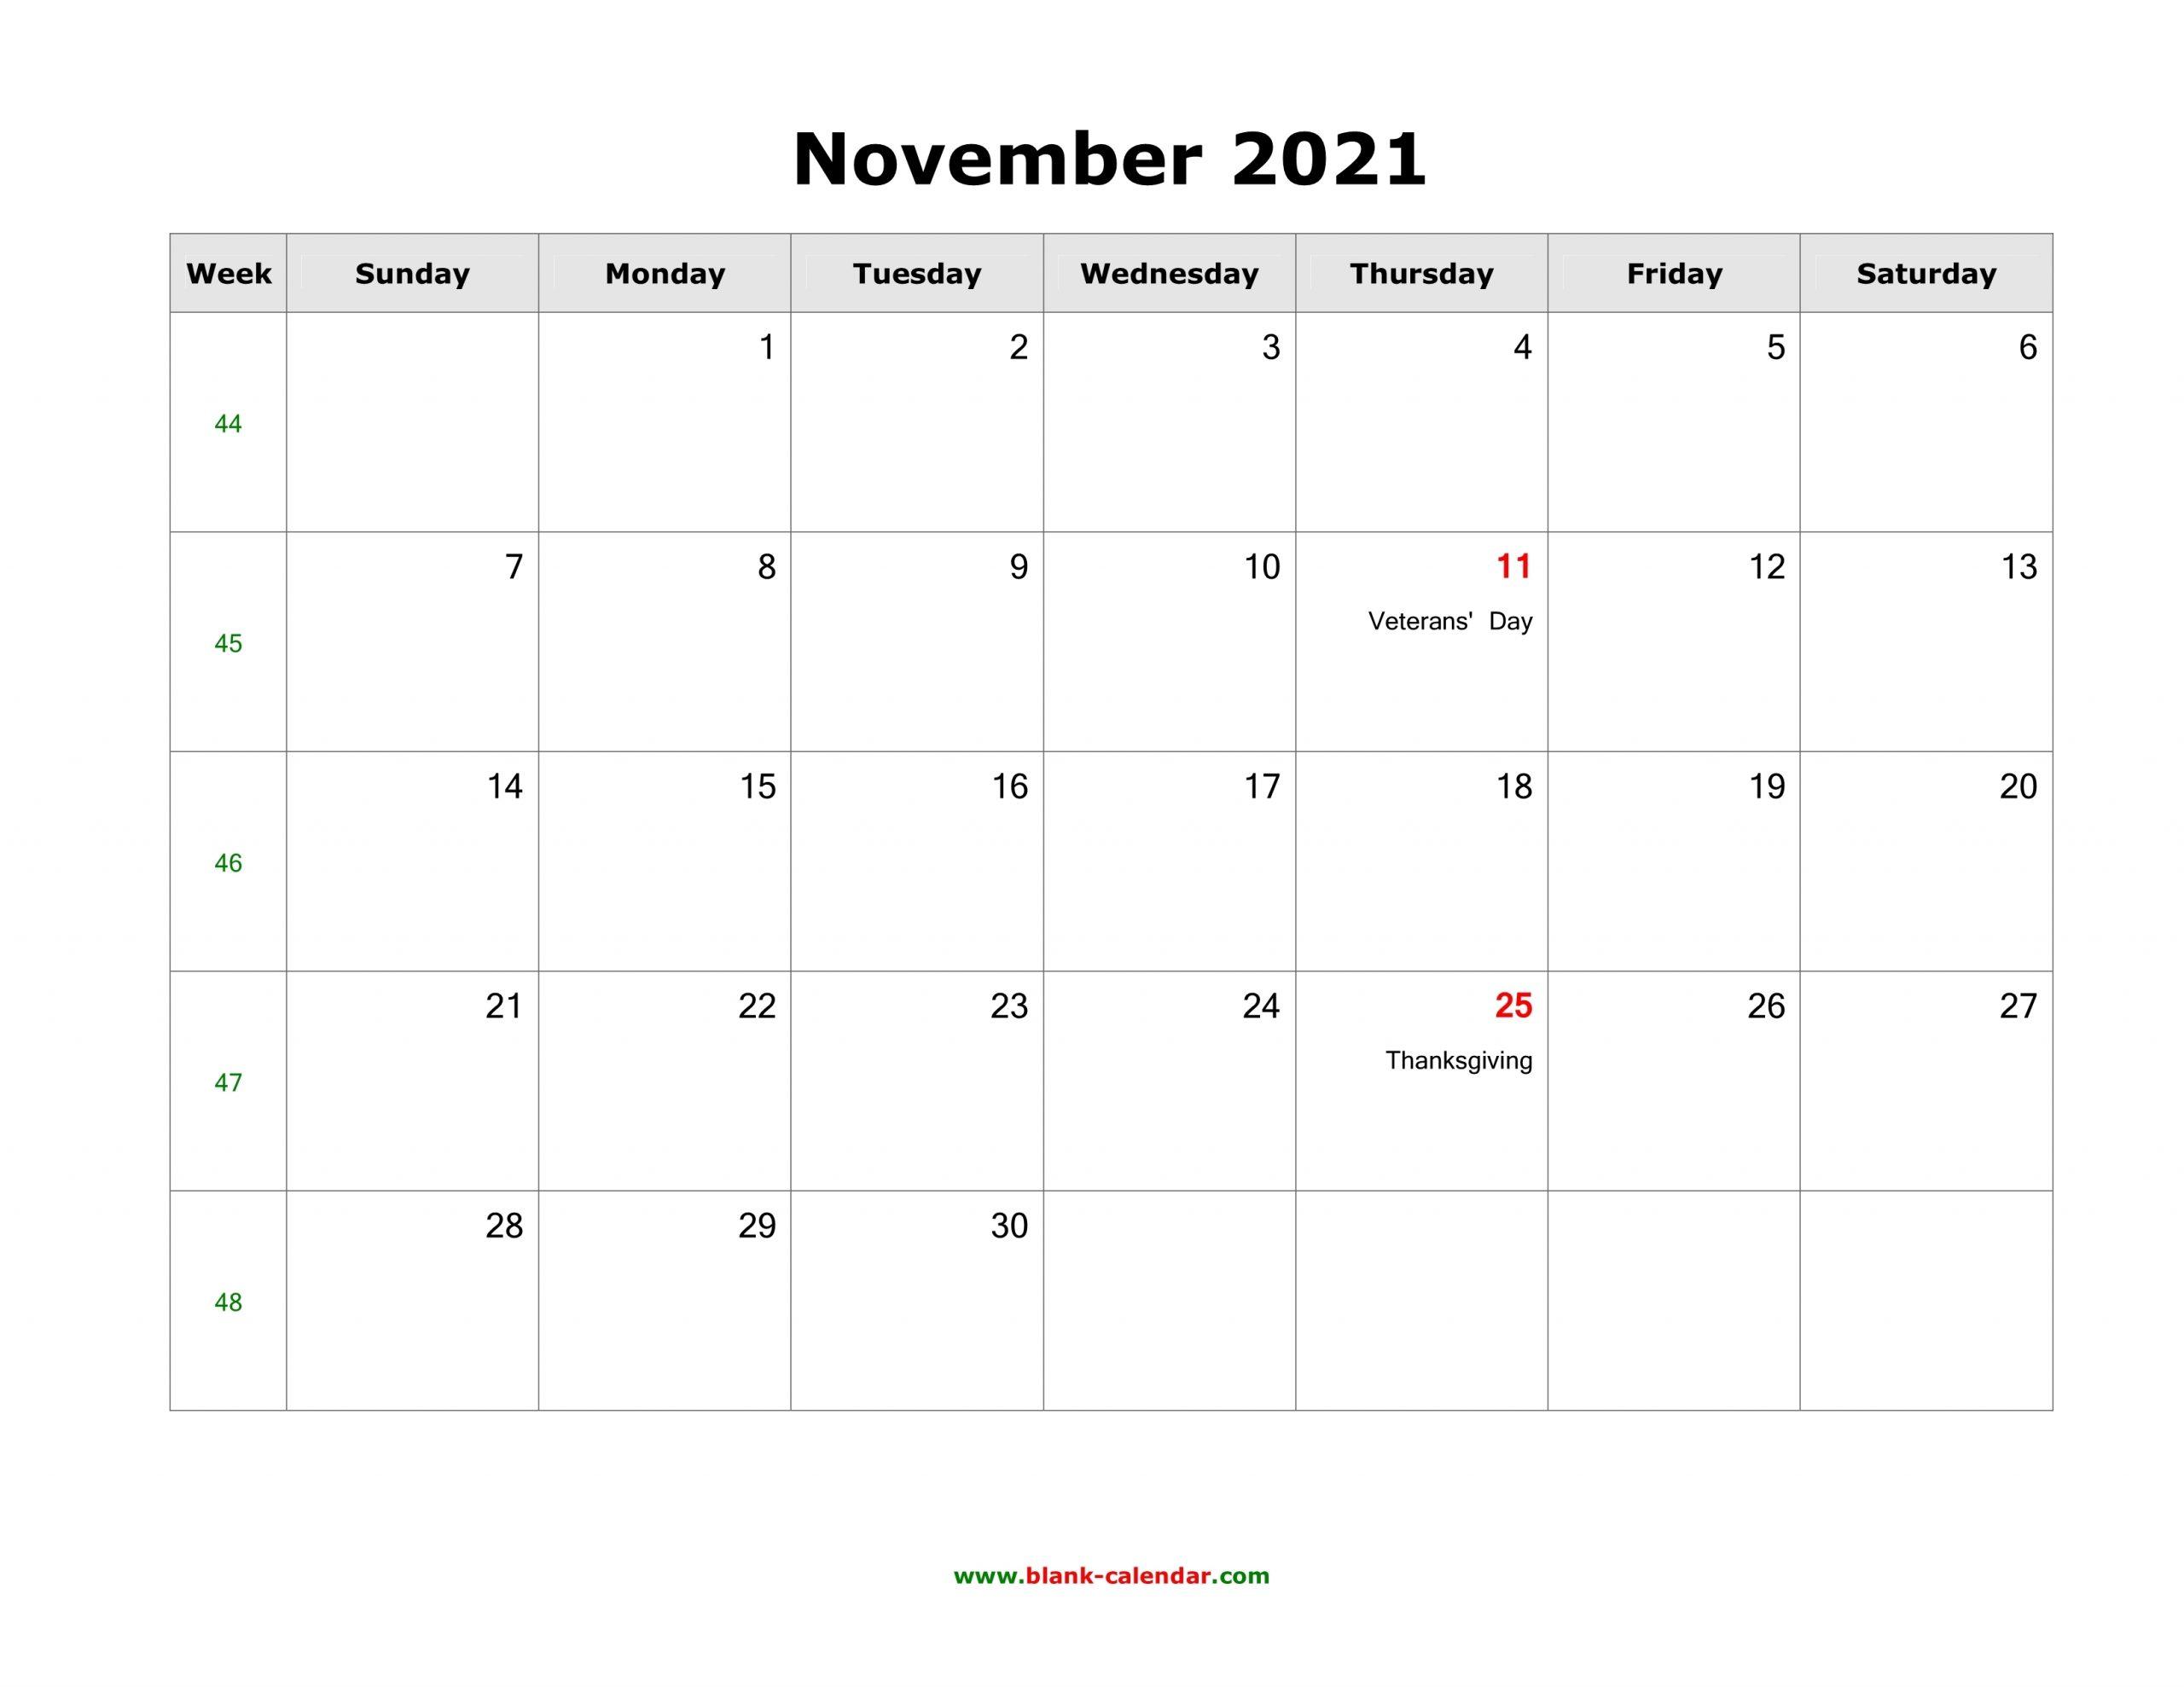 November 2021 Blank Calendar | Free Download Calendar